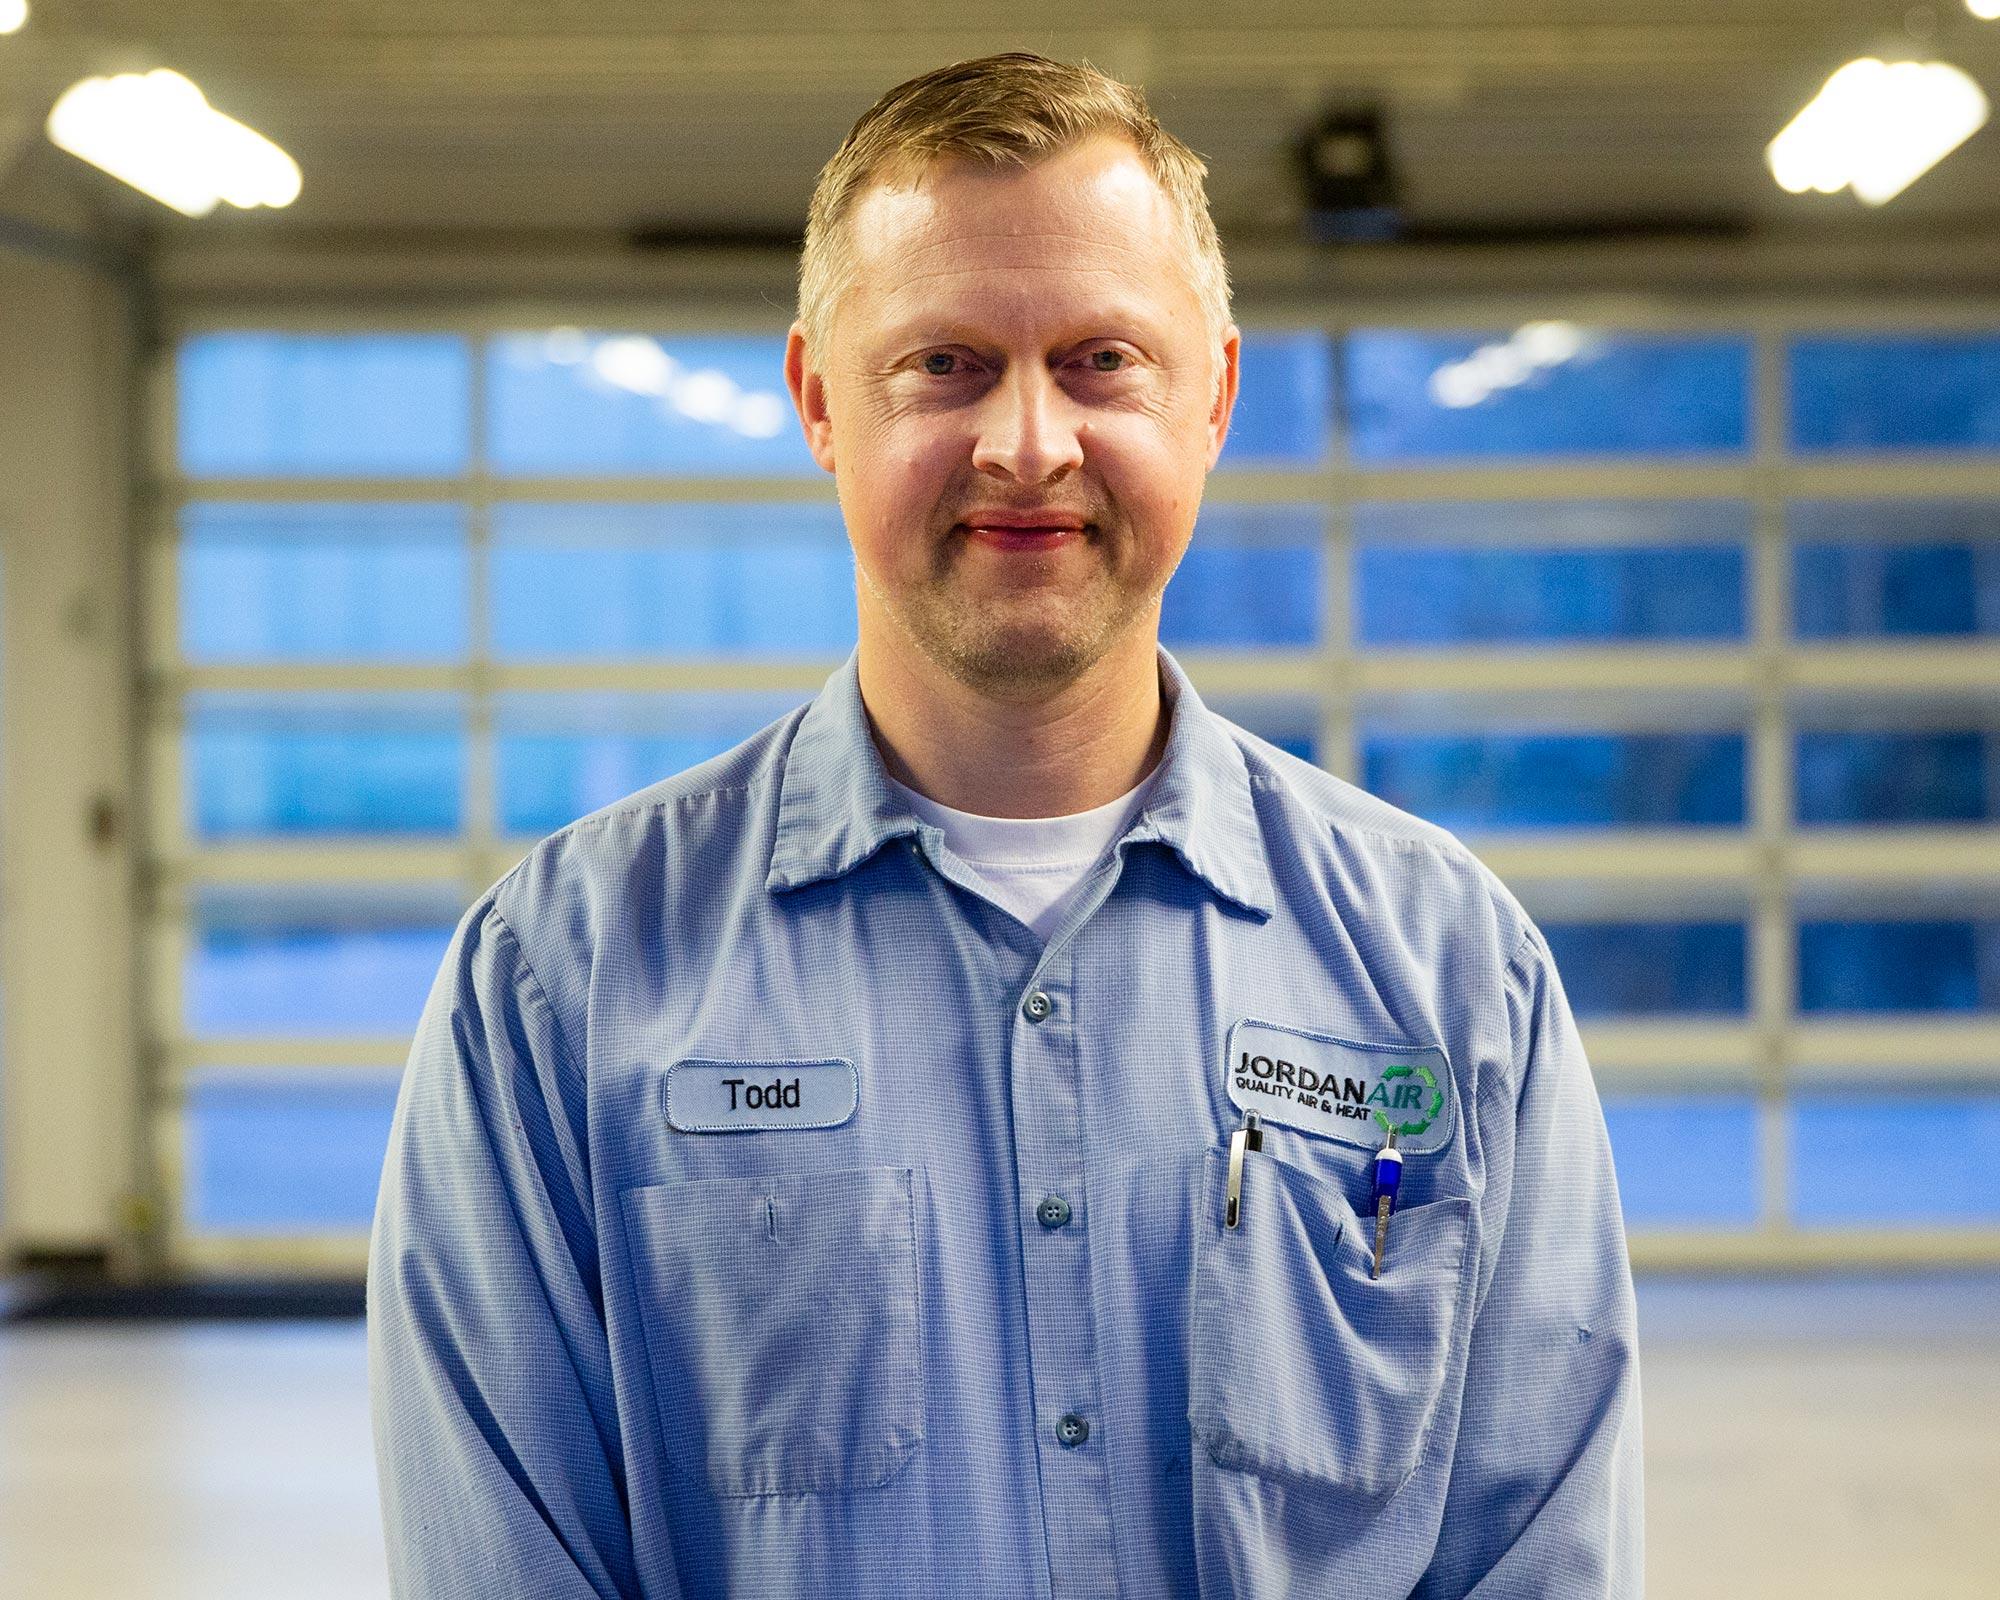 Todd-Kietzman-(Service-Technician).jpg